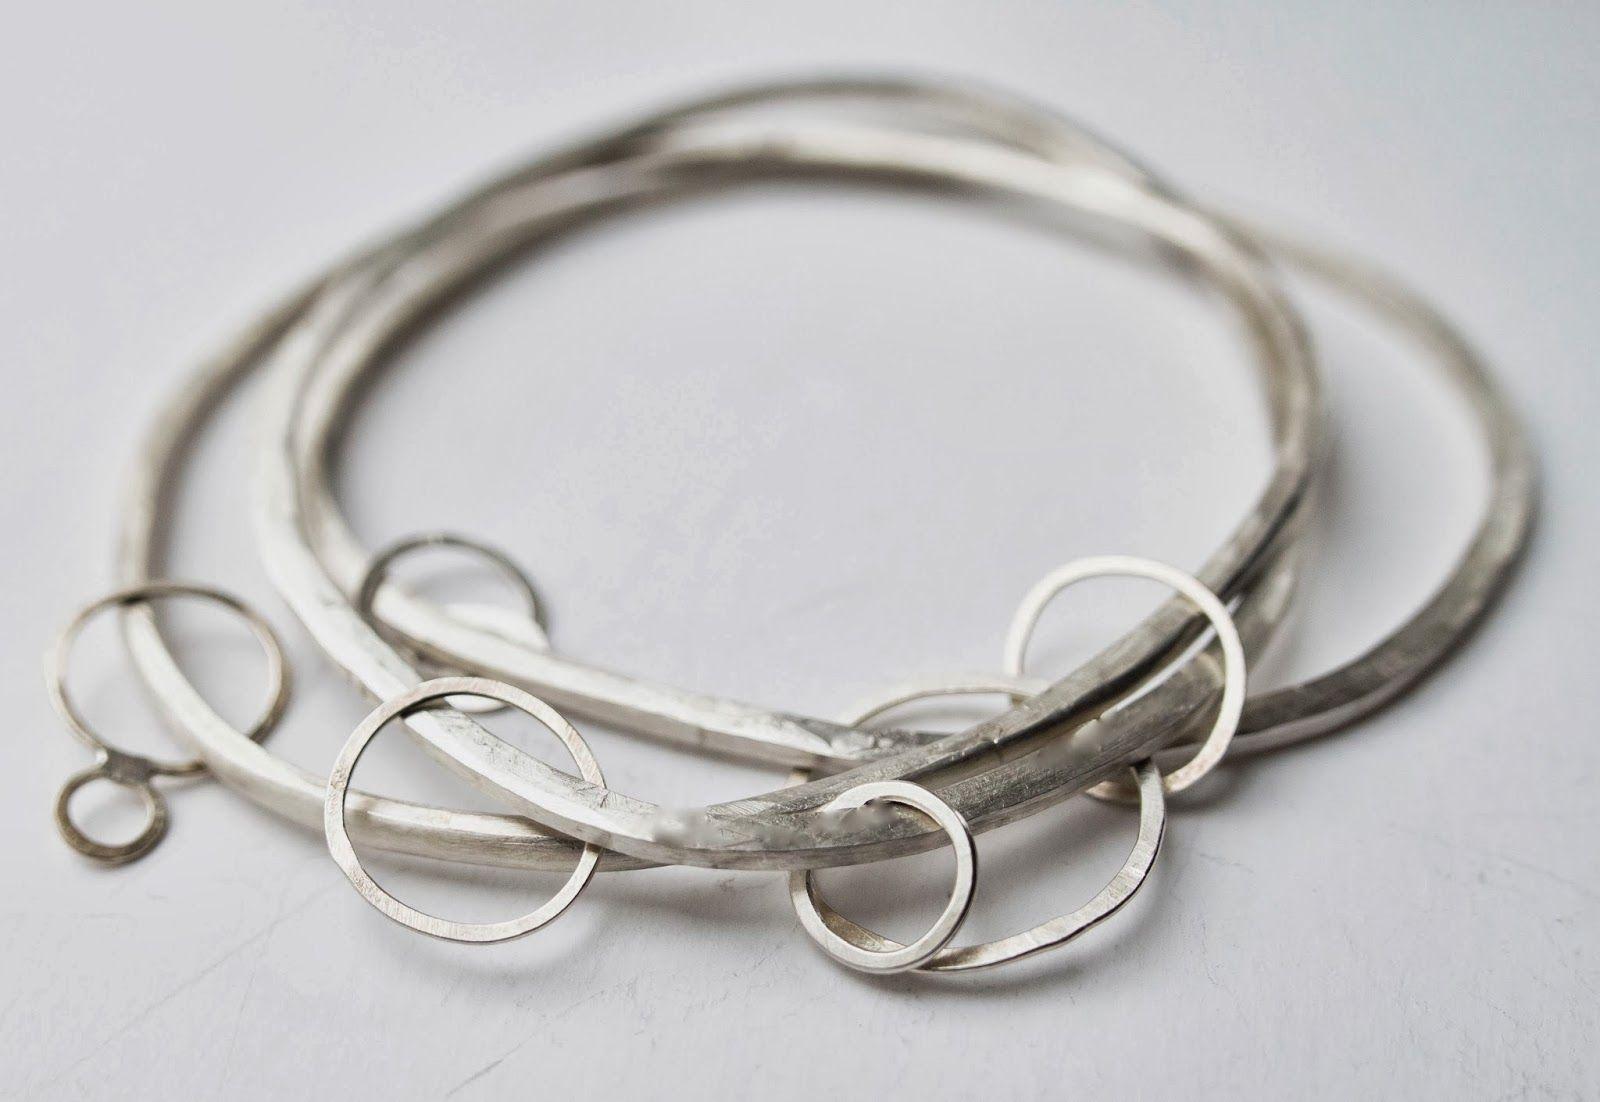 Hammered or Shiny Silver Heart Bangle Handmade 2mm